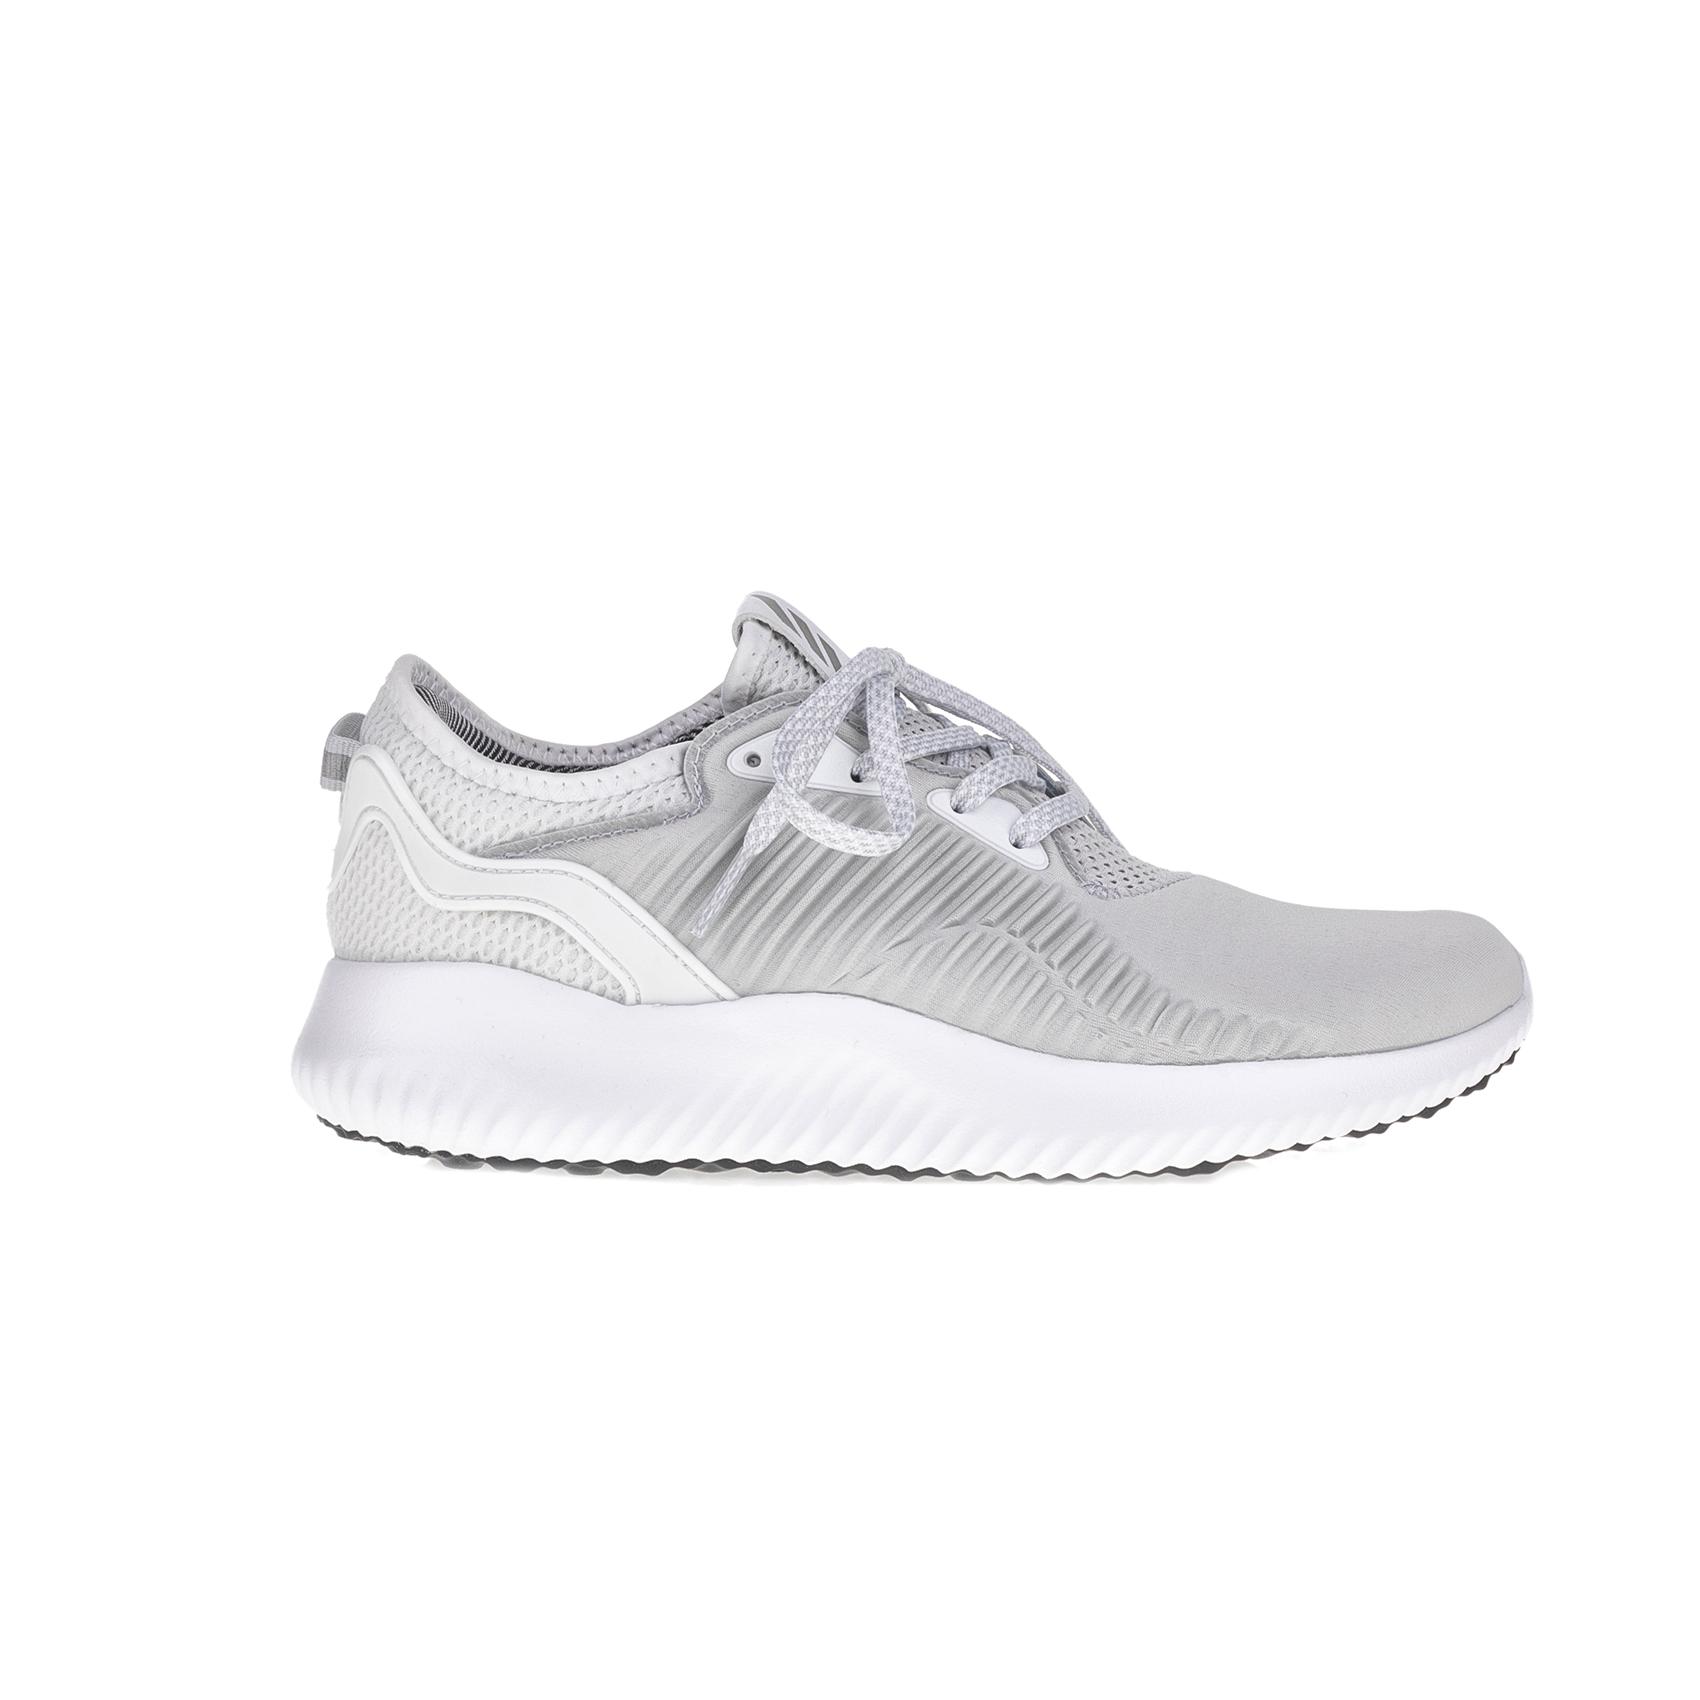 adidas Originals - Γυναικεία παπούτσια adidas alphabounce γκρι γυναικεία παπούτσια αθλητικά running